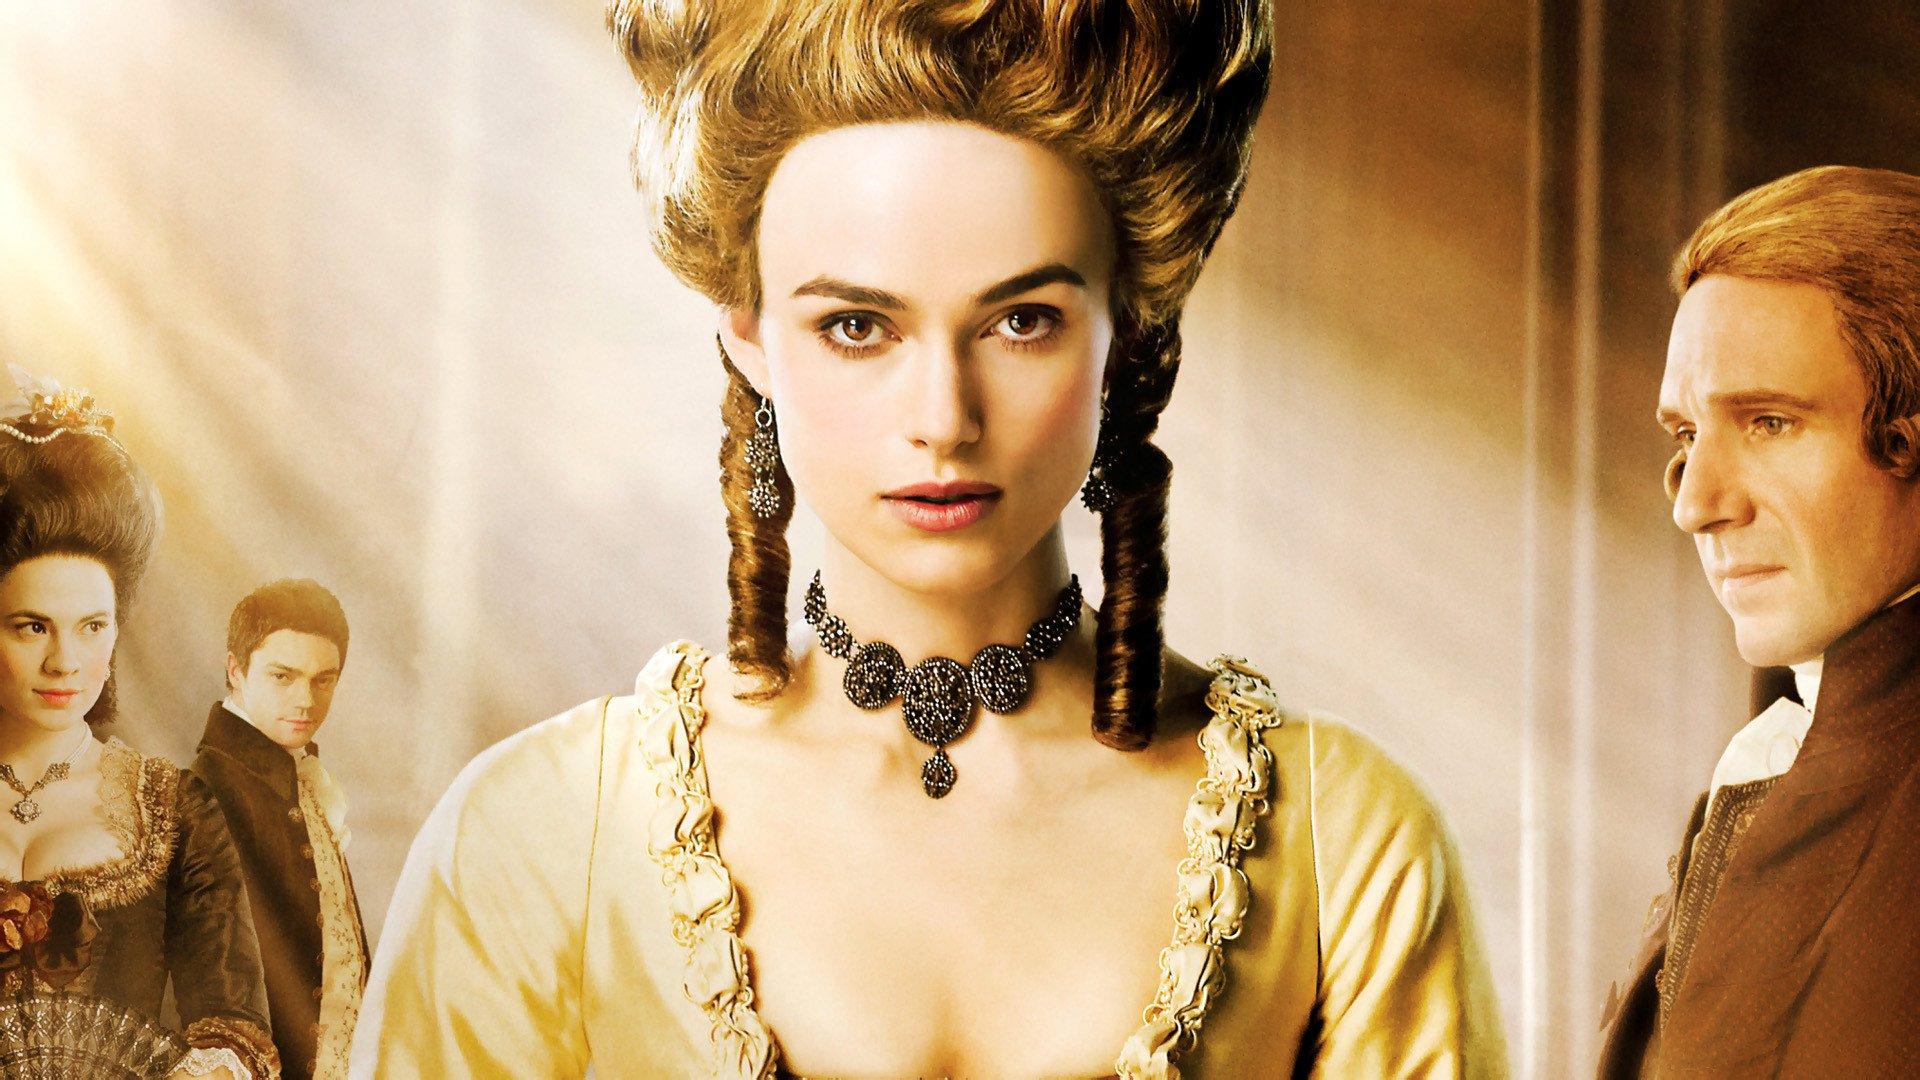 Regarder The Duchess en streaming gratuit